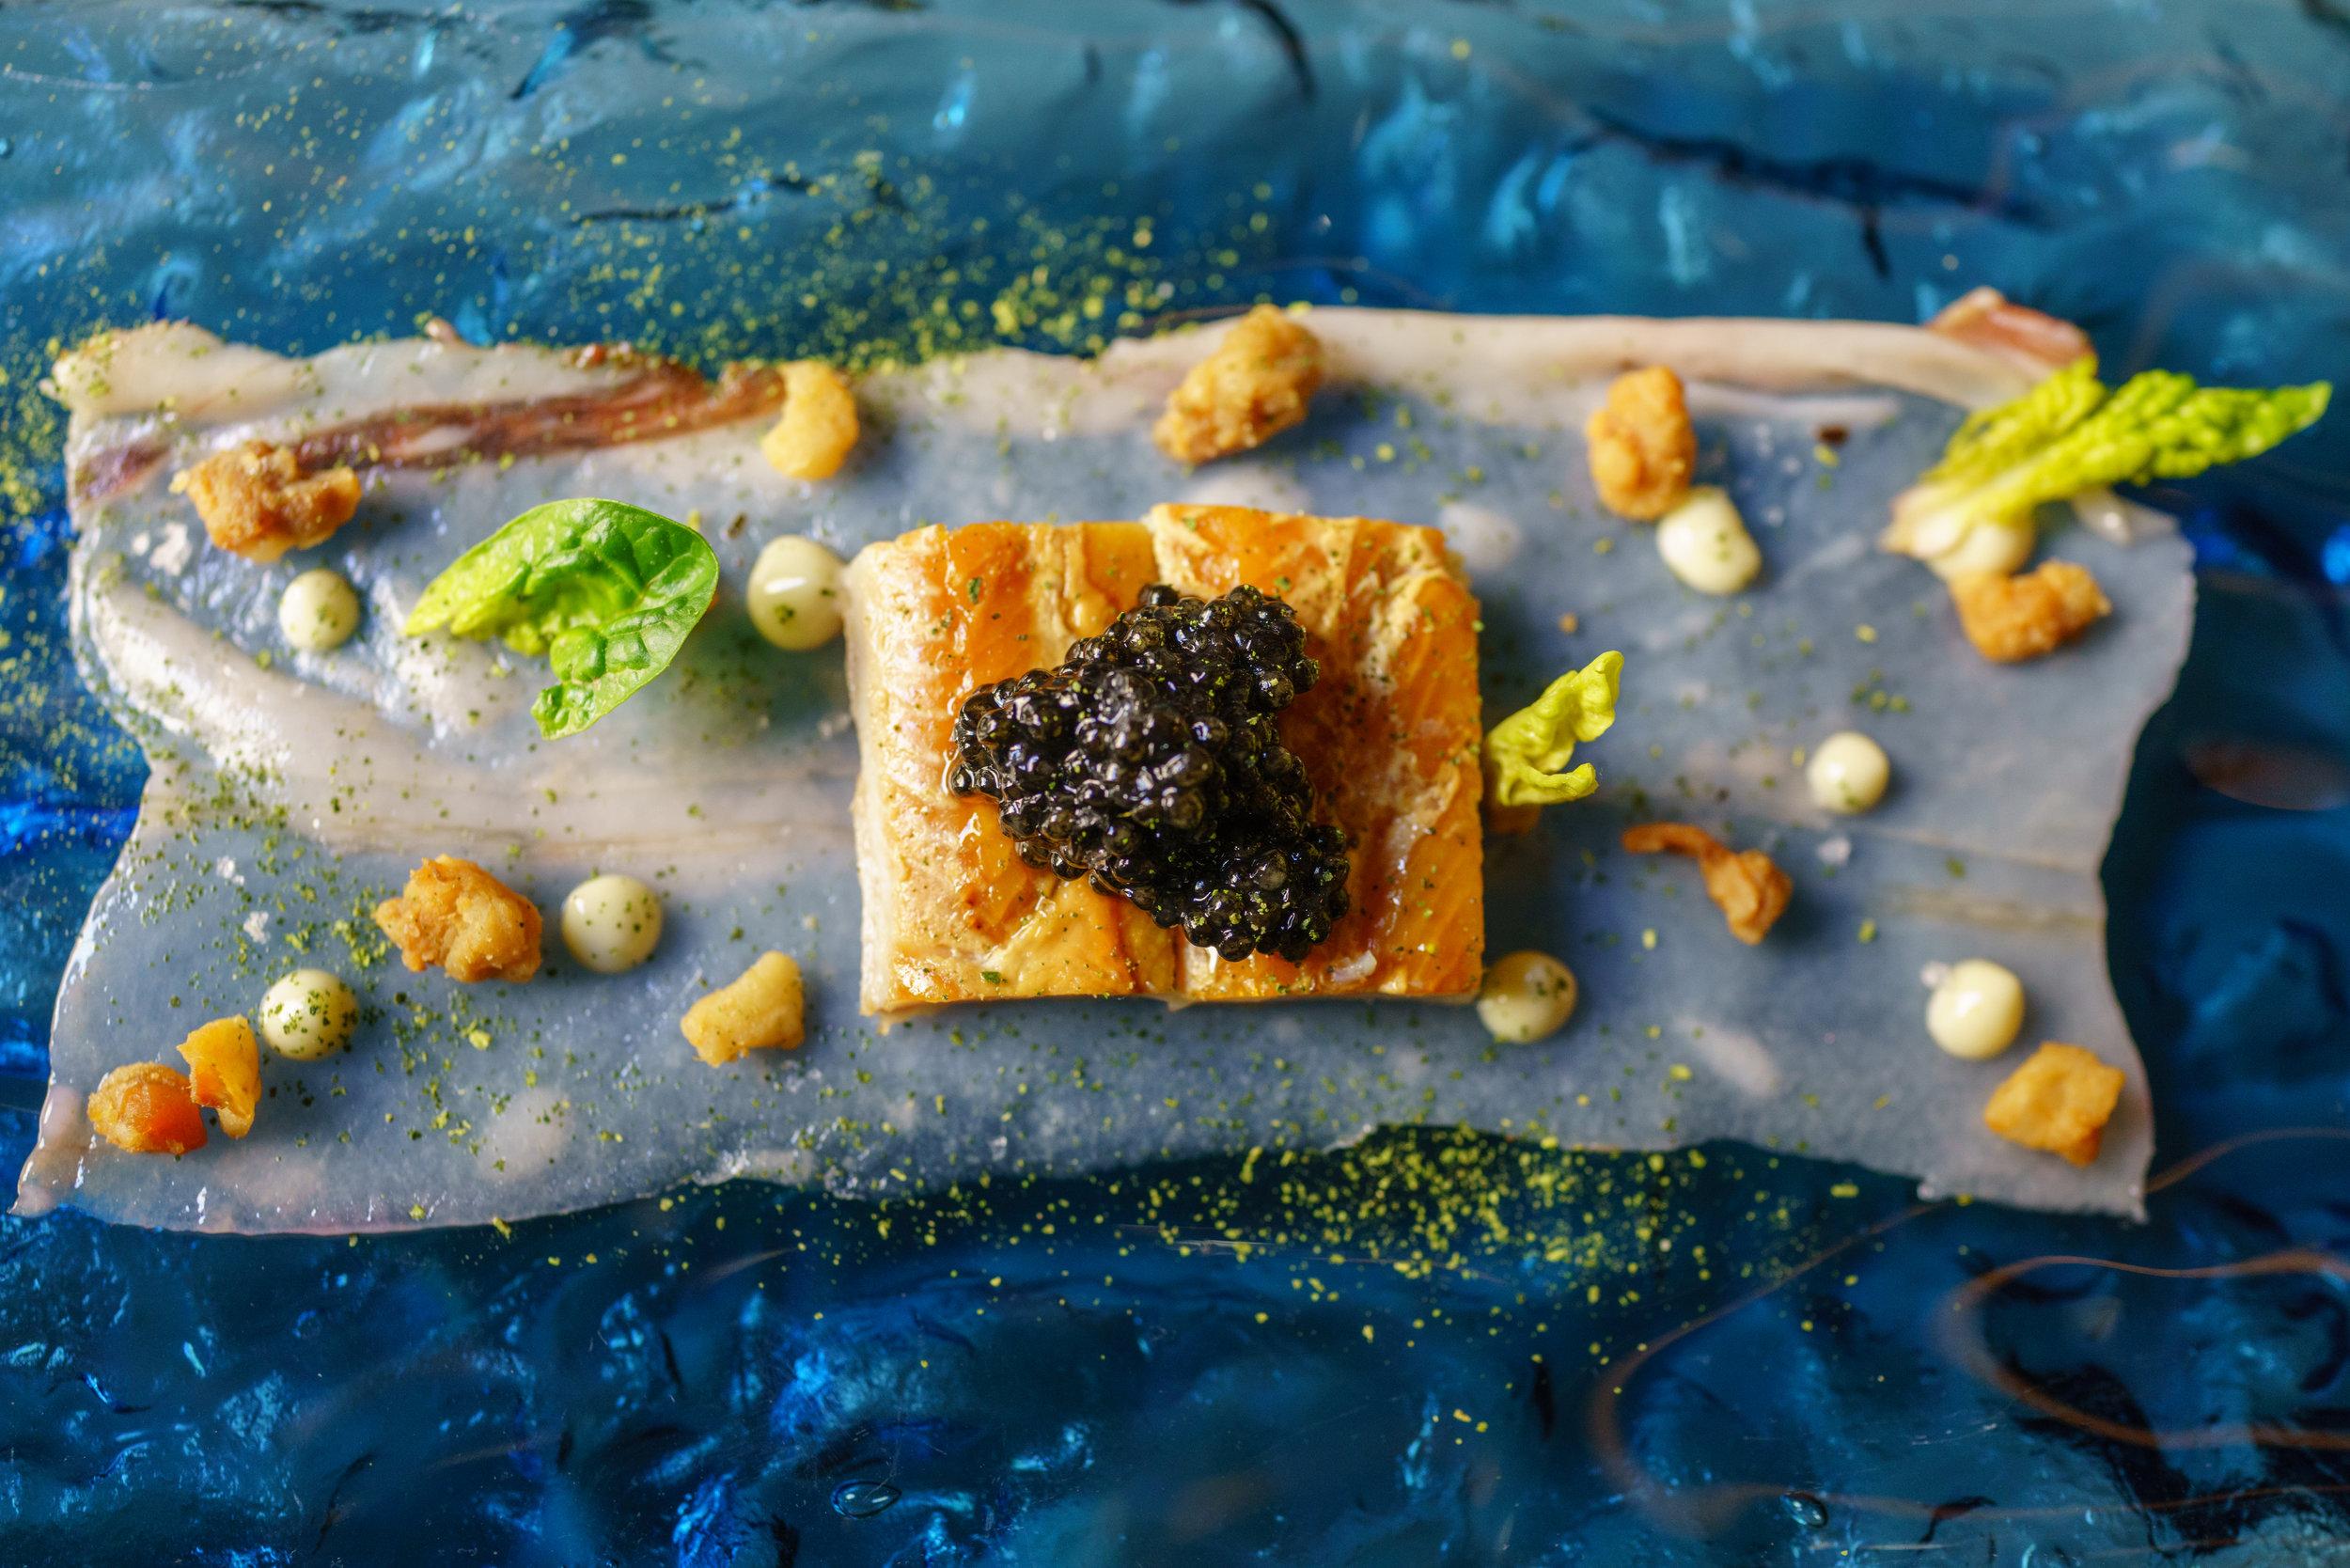 Marinated salmon, Pork skin, Green apple, Amaranth